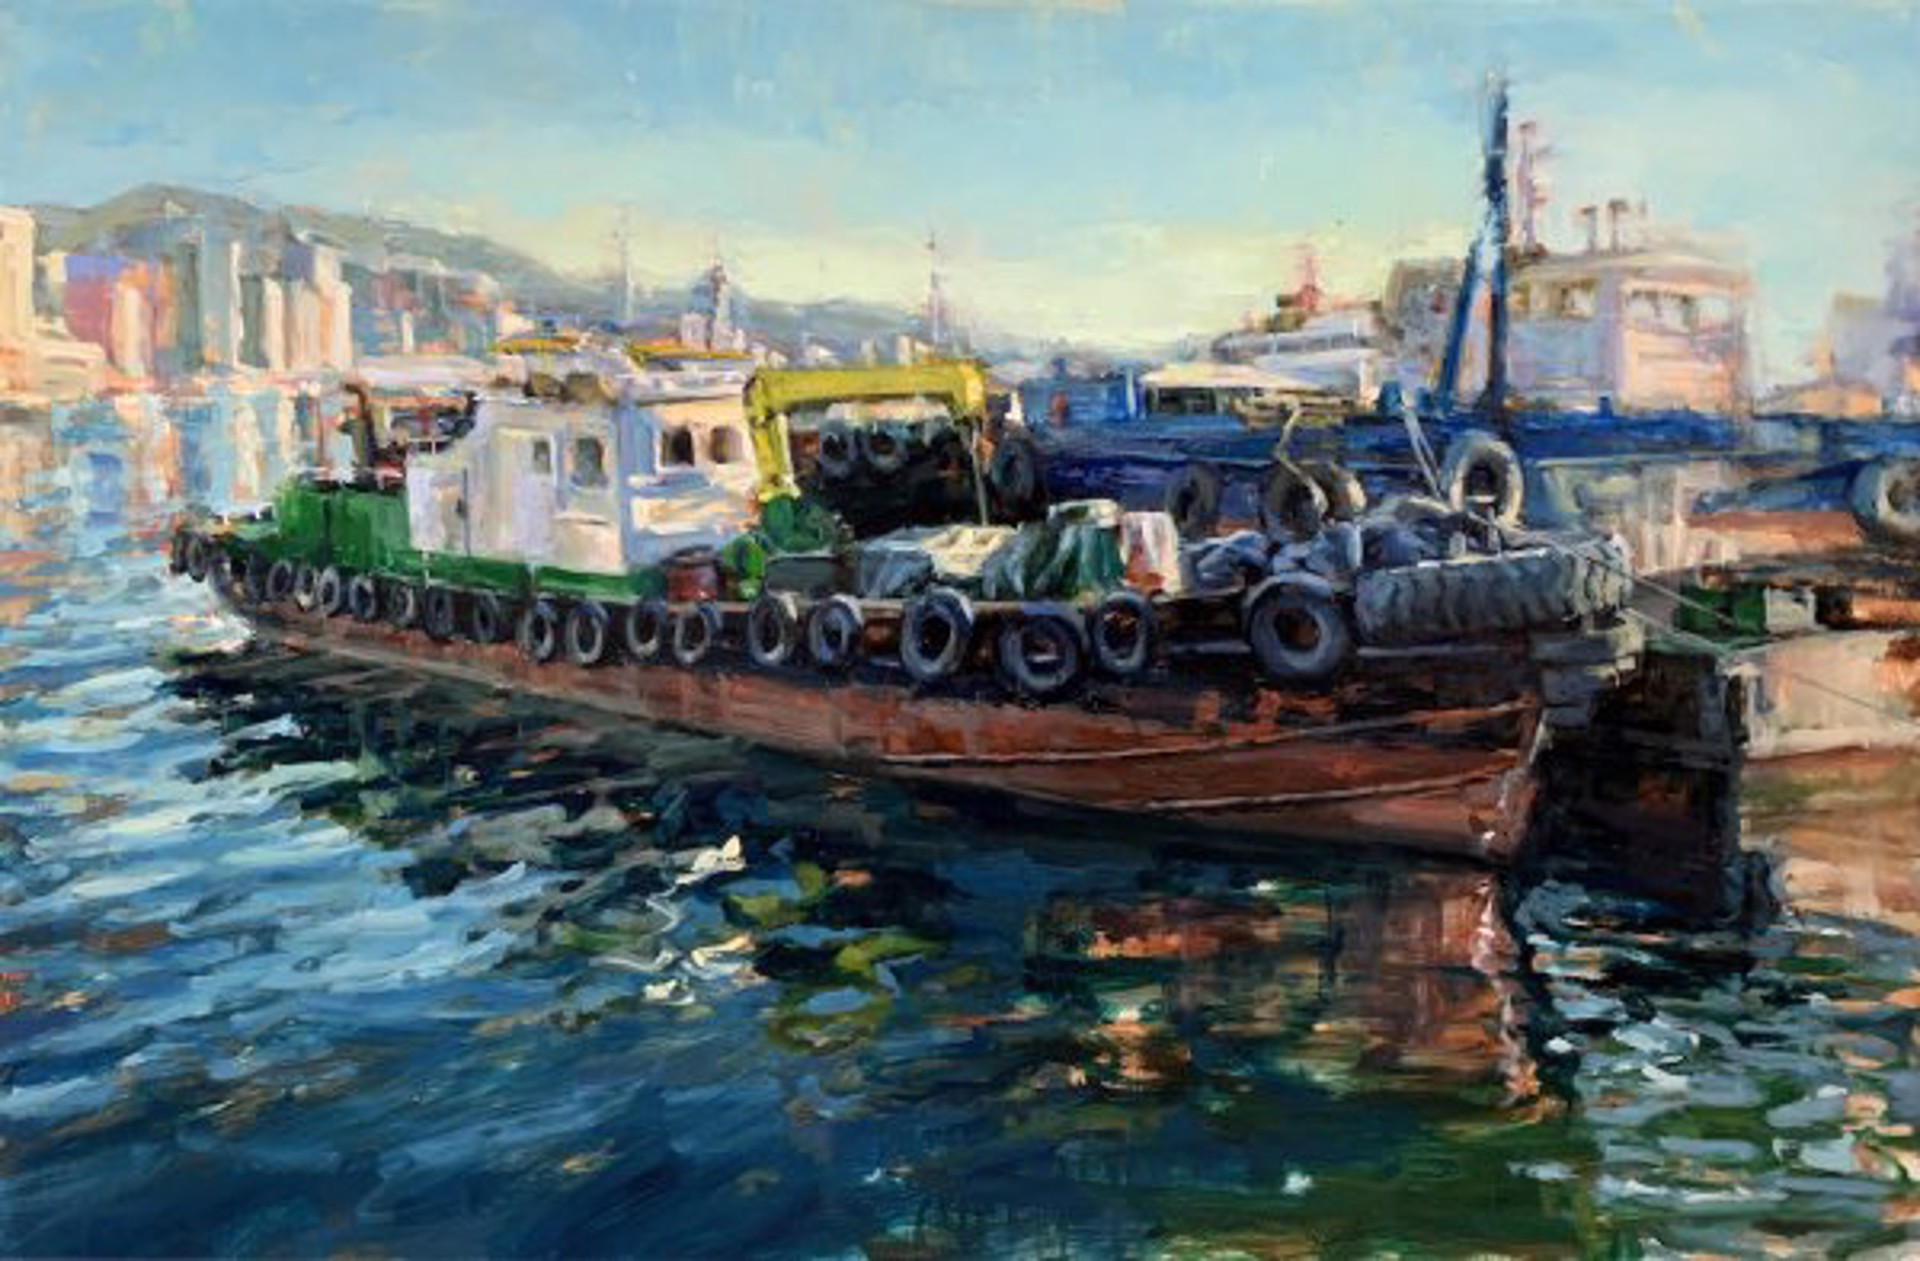 Pil Ho Lee: Busan Harbor by Pil Ho Lee